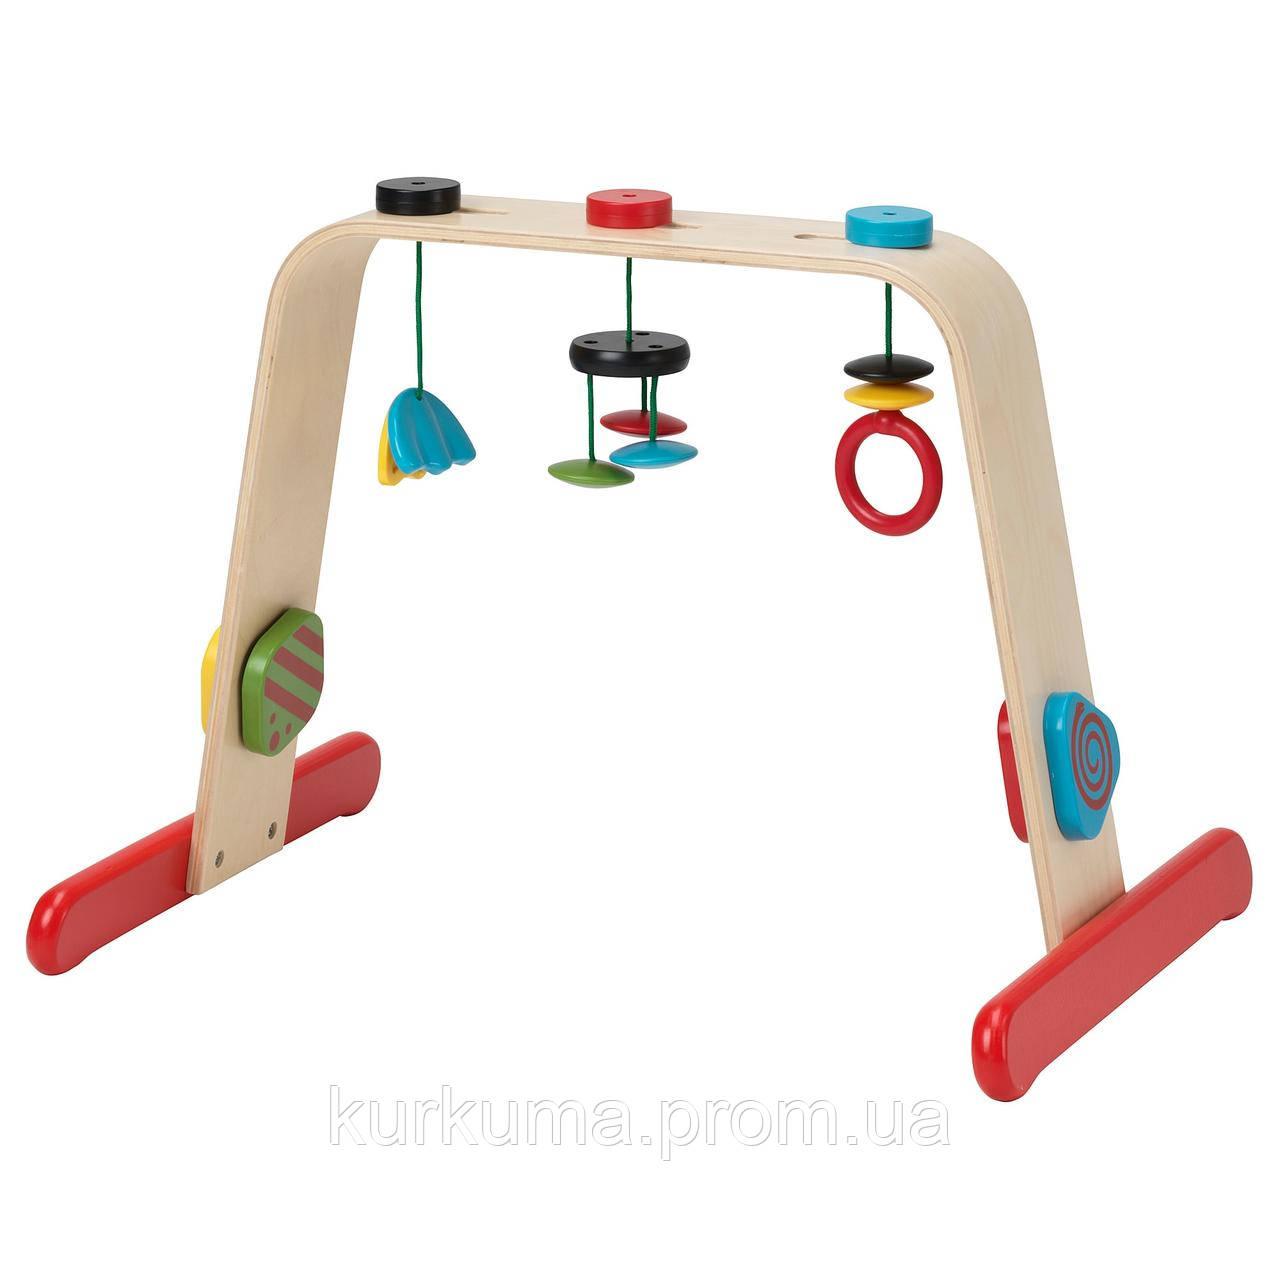 IKEA LEKA Стойка с игрушками, береза, разноцветный  (701.081.77)